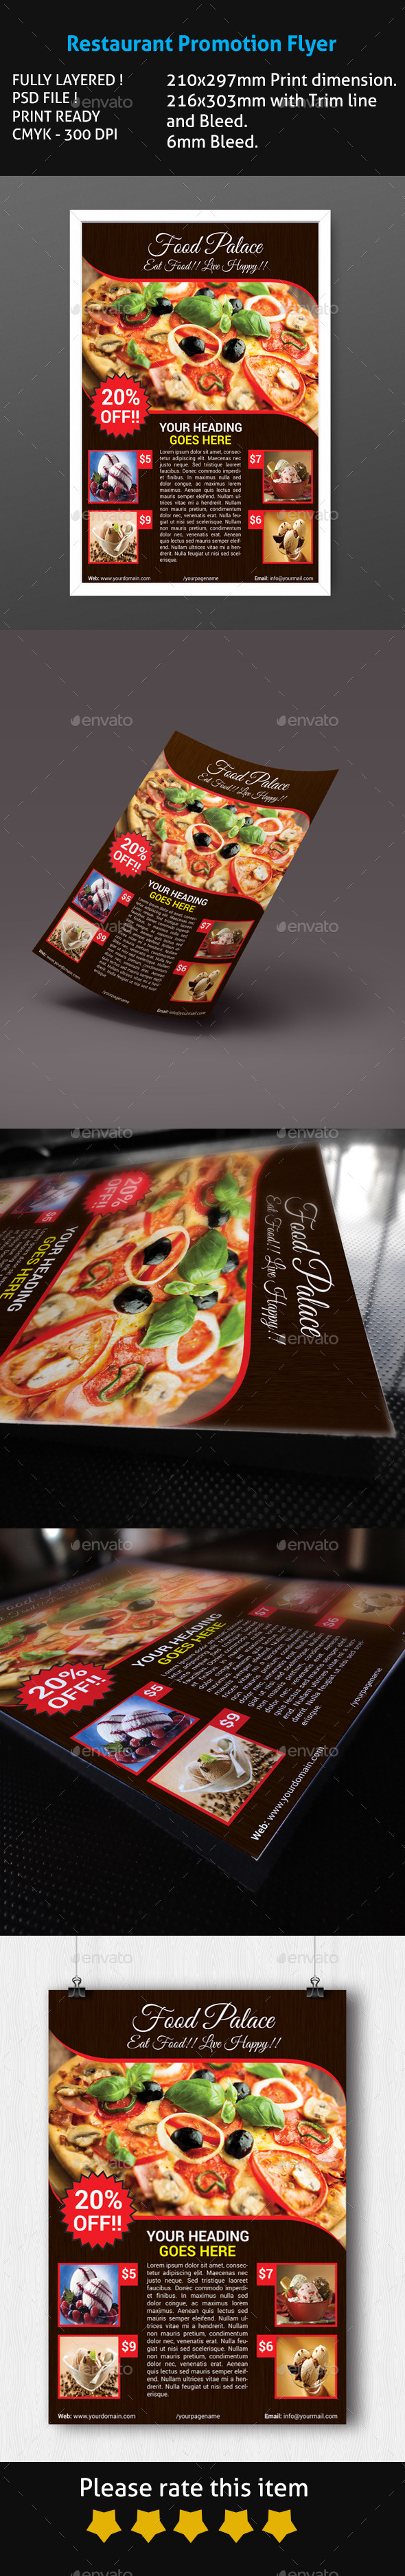 Restaurant Promotion Flyer - Restaurant Flyers